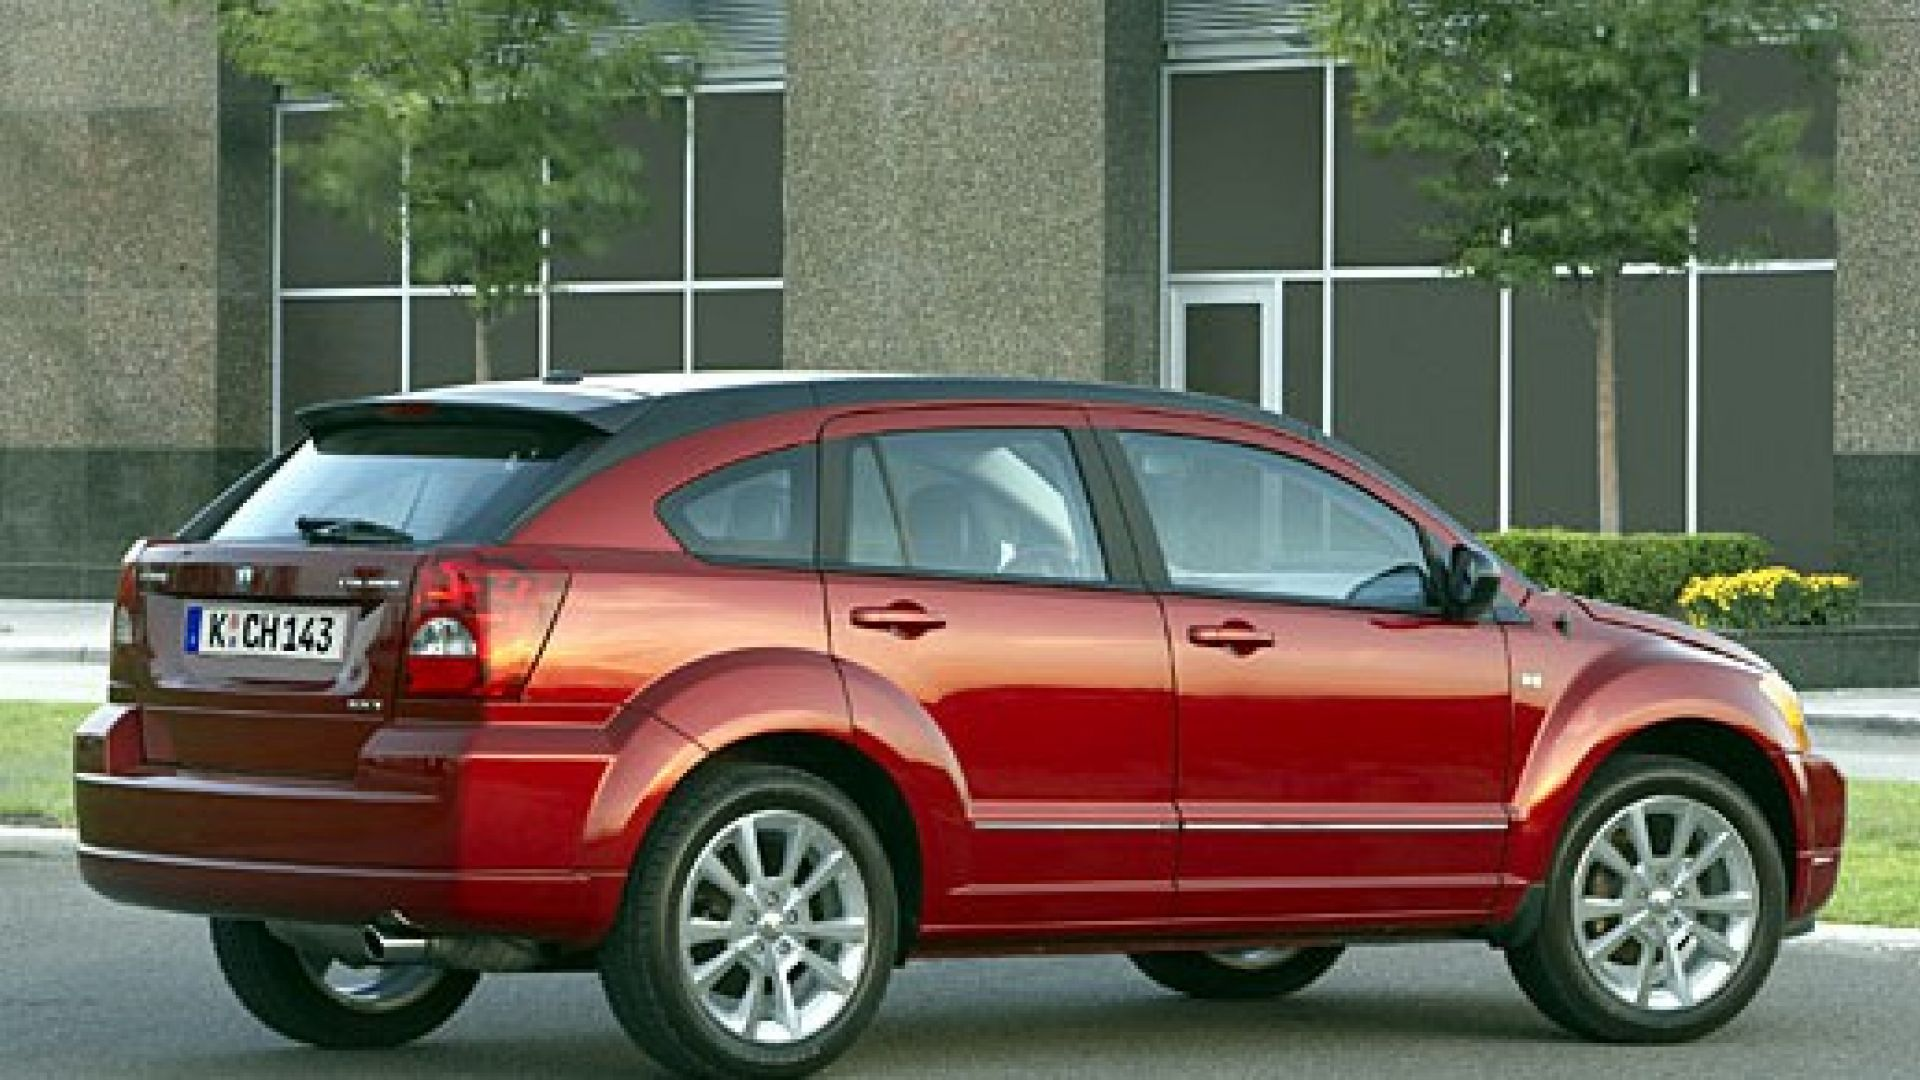 Prossimamente:: Dodge Caliber my 2010 - MotorBox